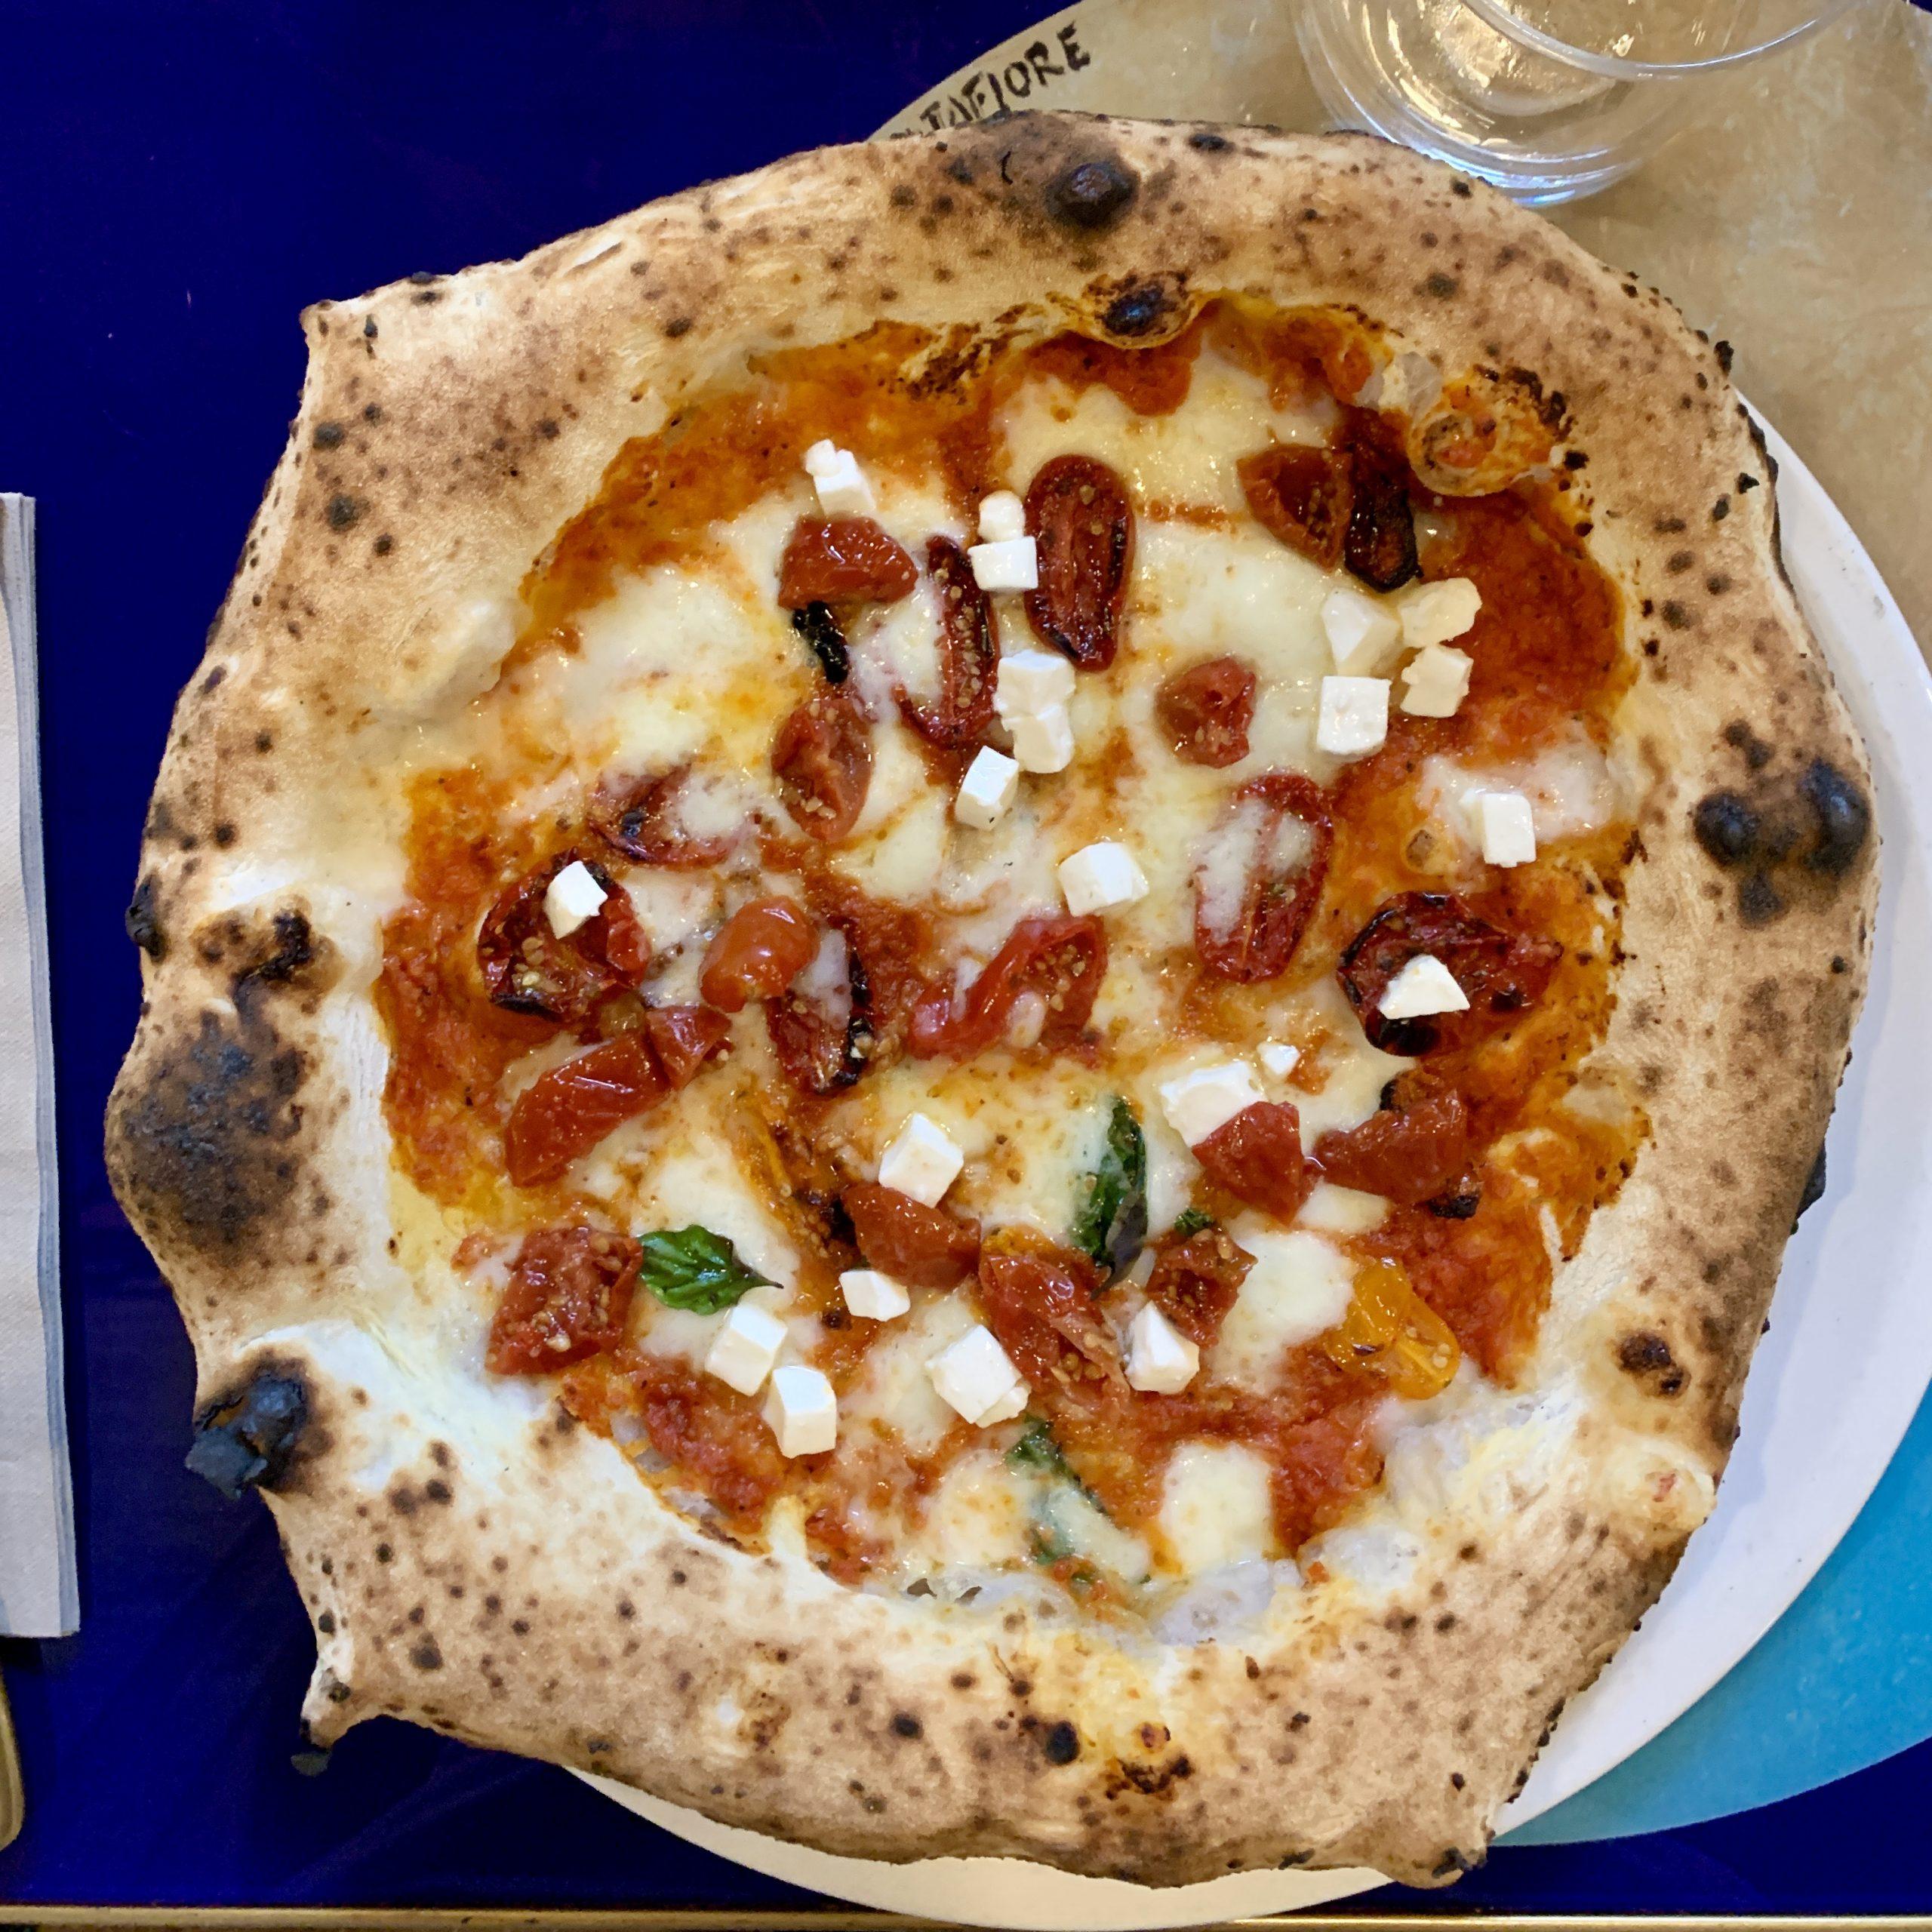 Assoluto di pomodori (Sophia Loren Original Italian Food)